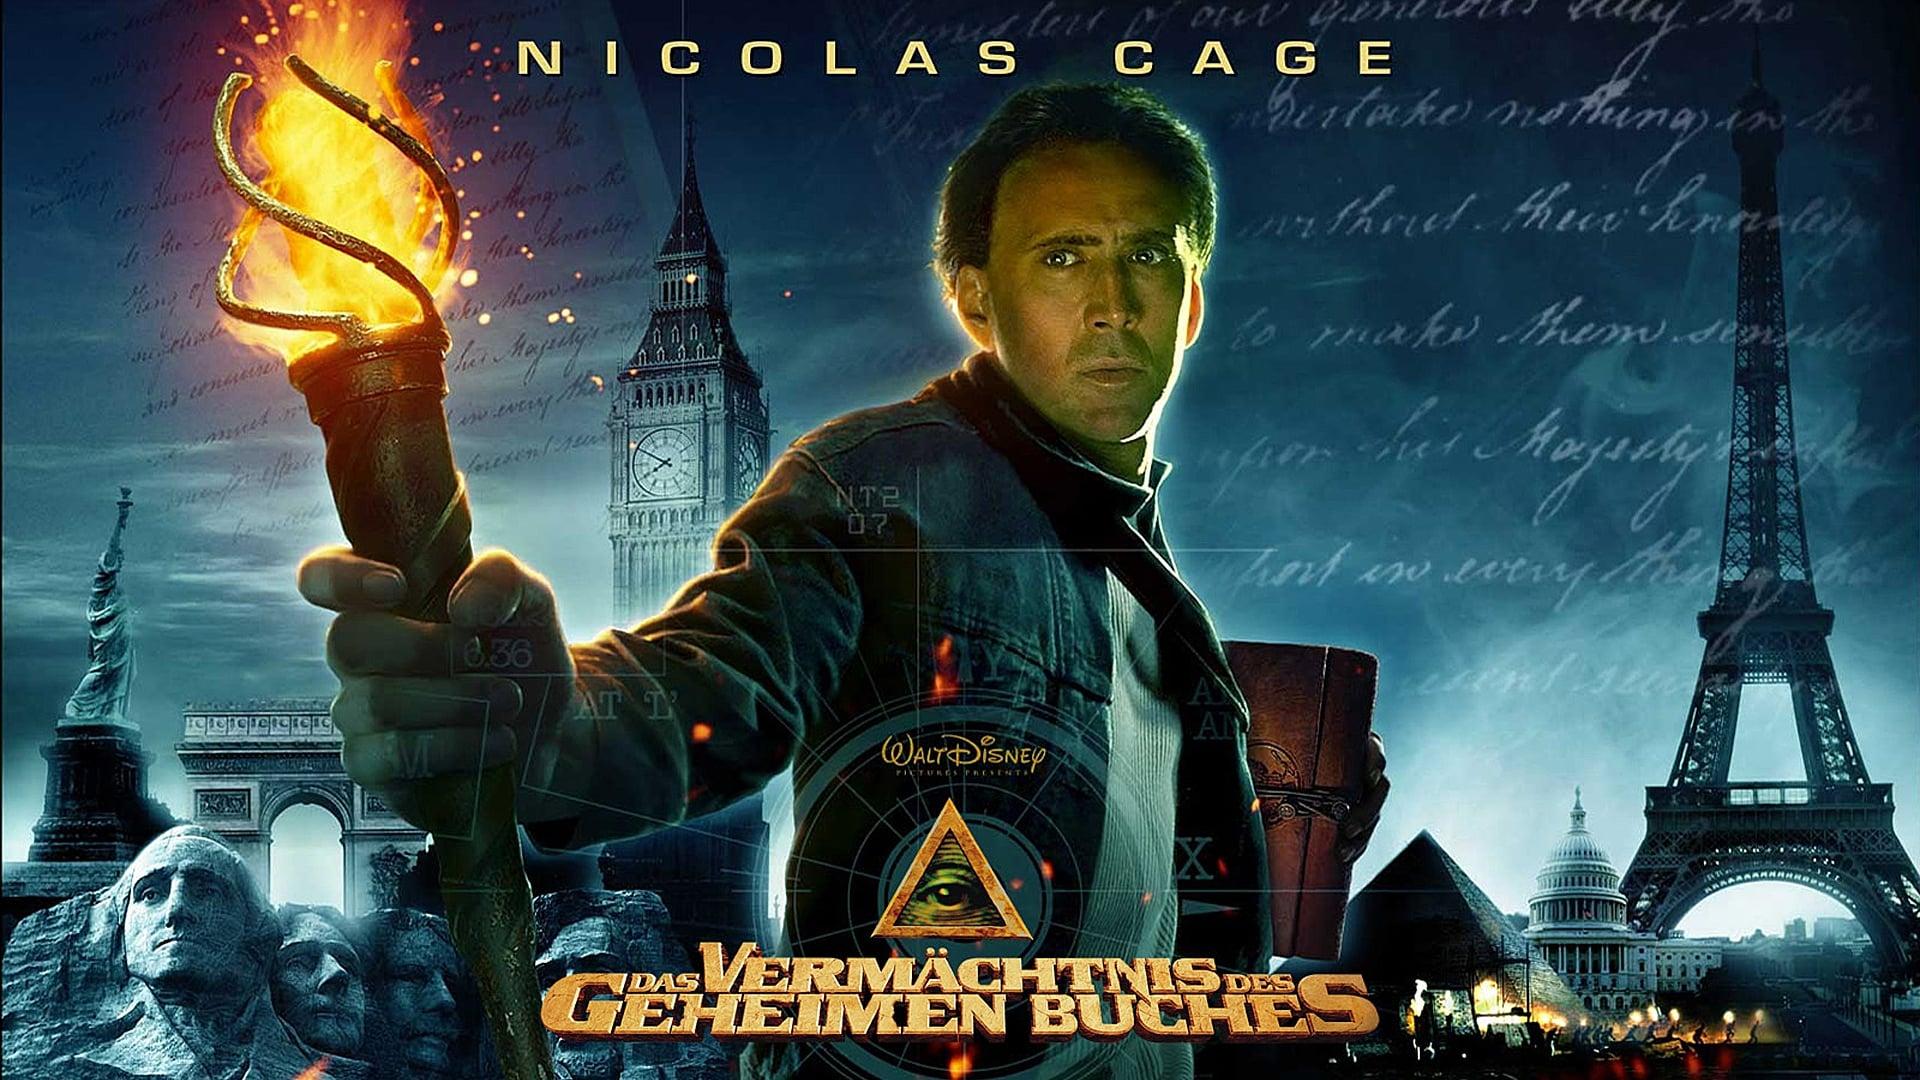 National Treasure: Book of Secrets Trailer